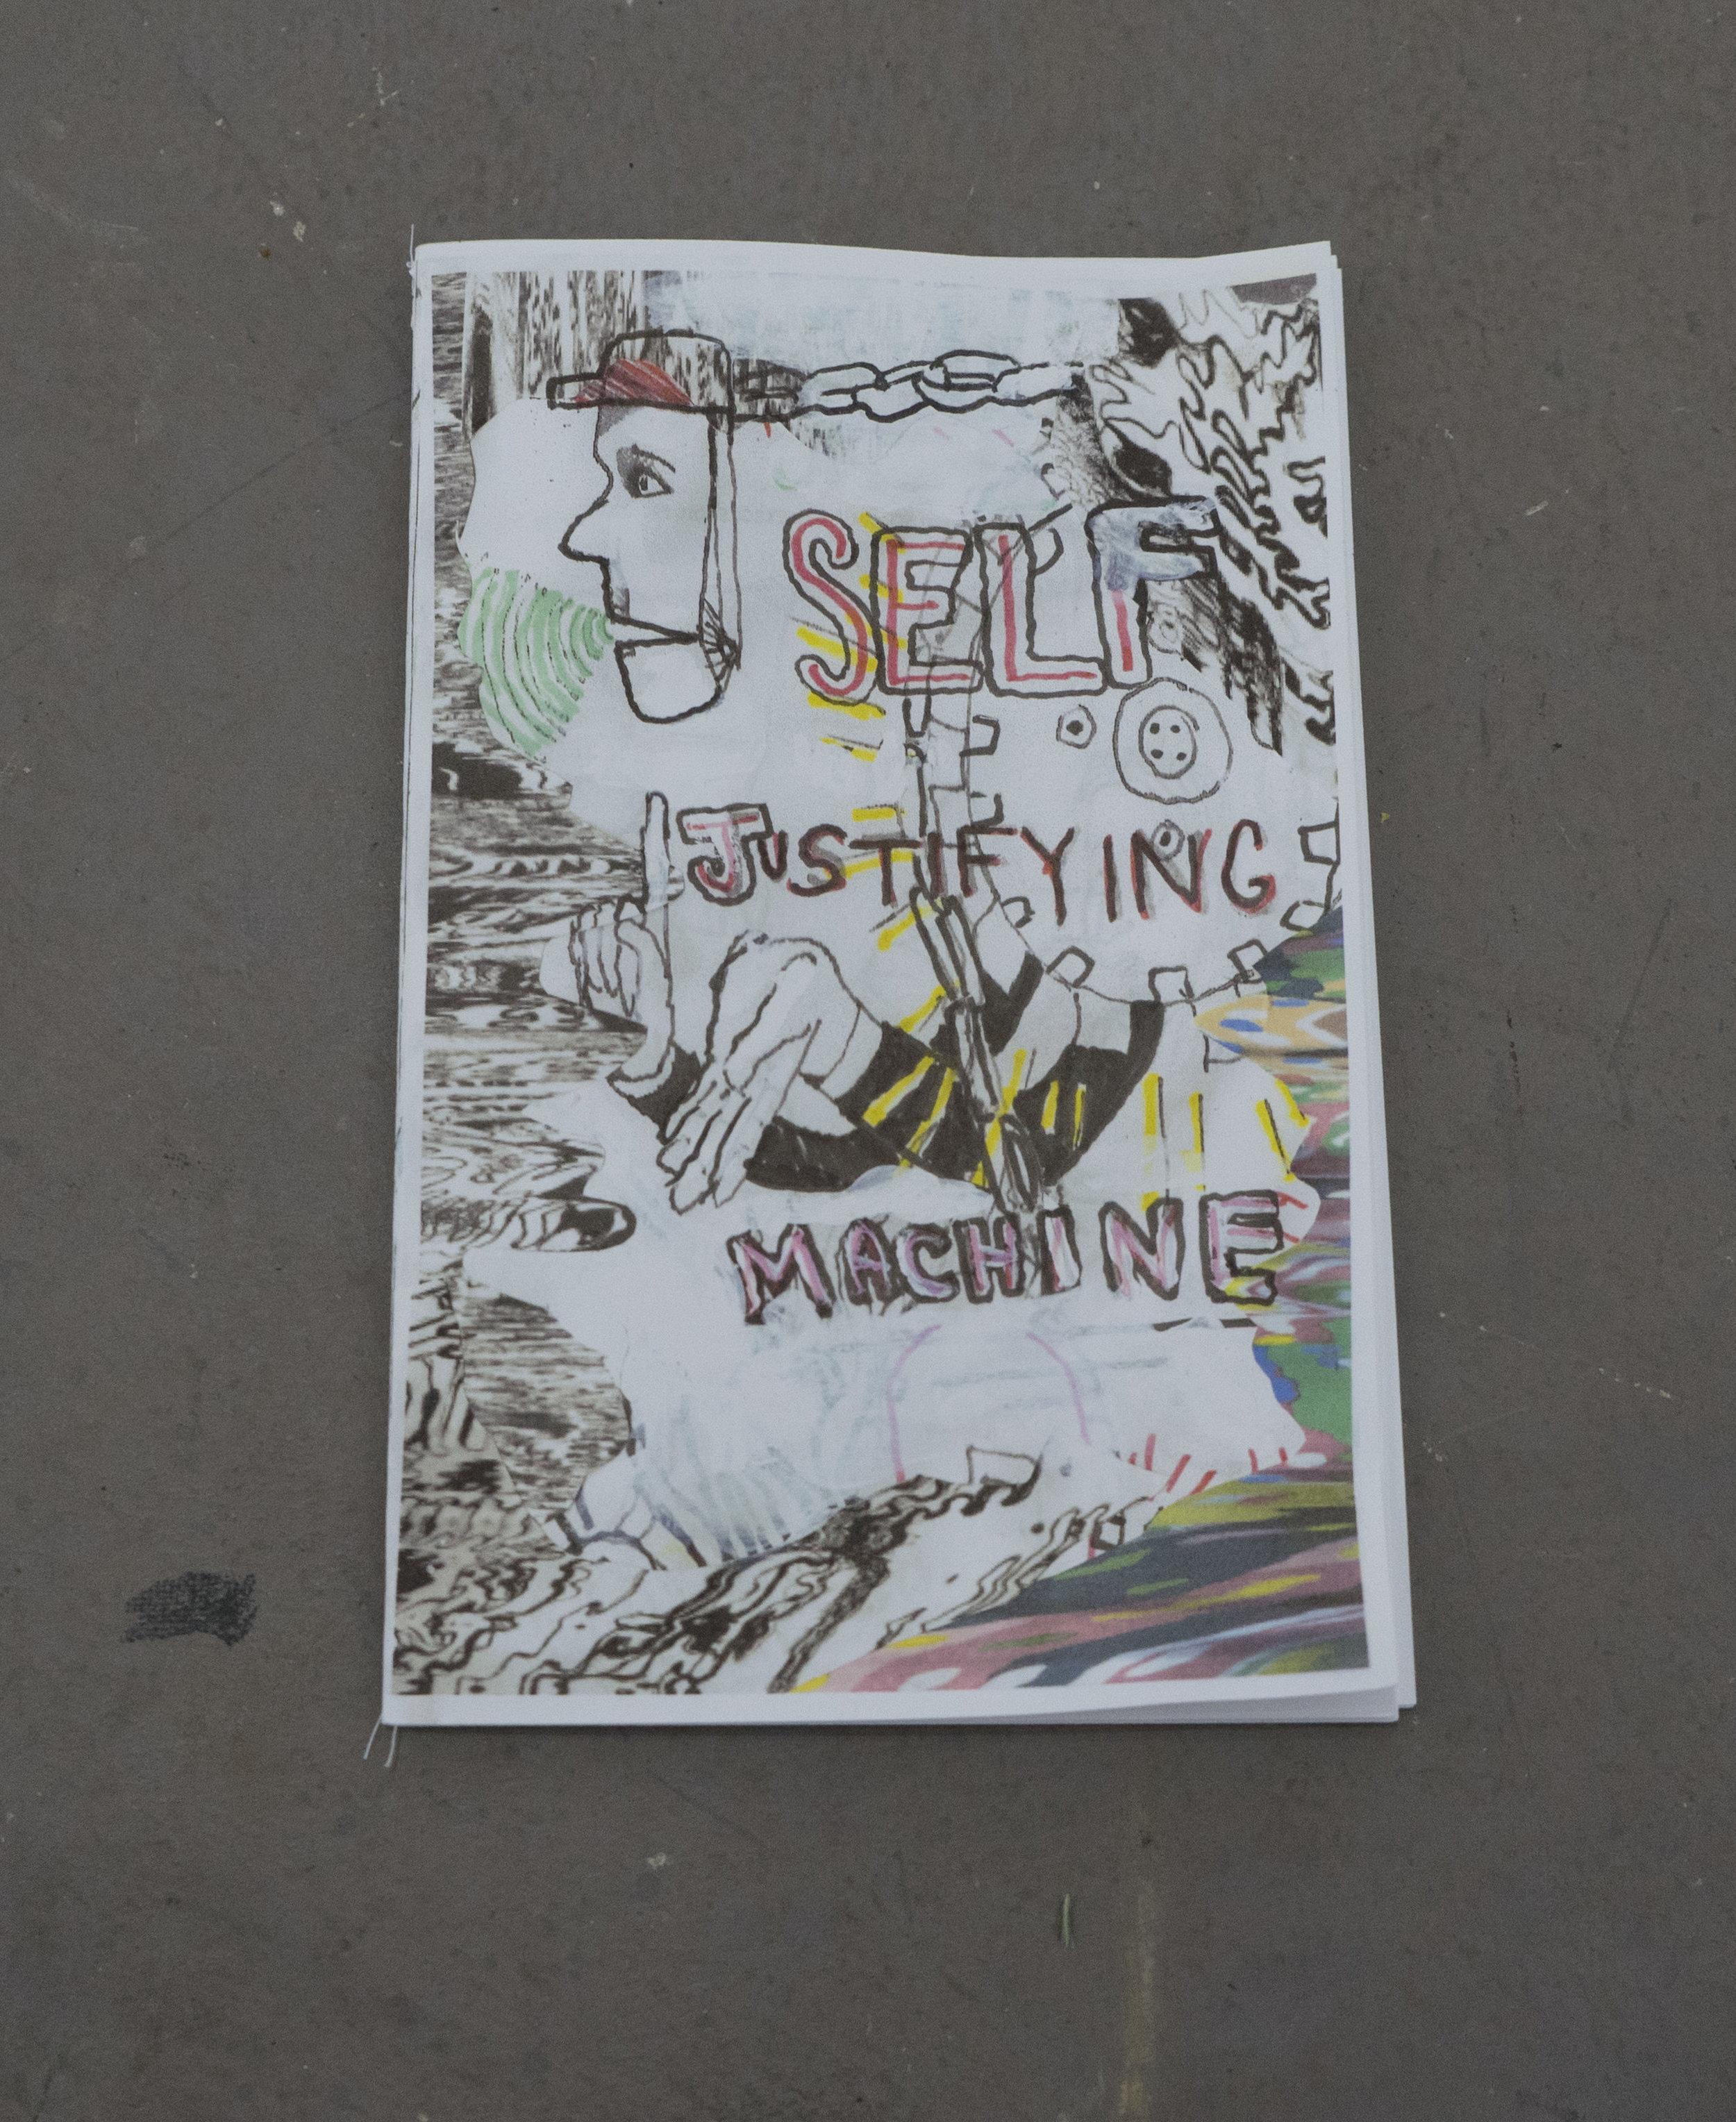 Self Justifying Machine -zine by Matt Christy